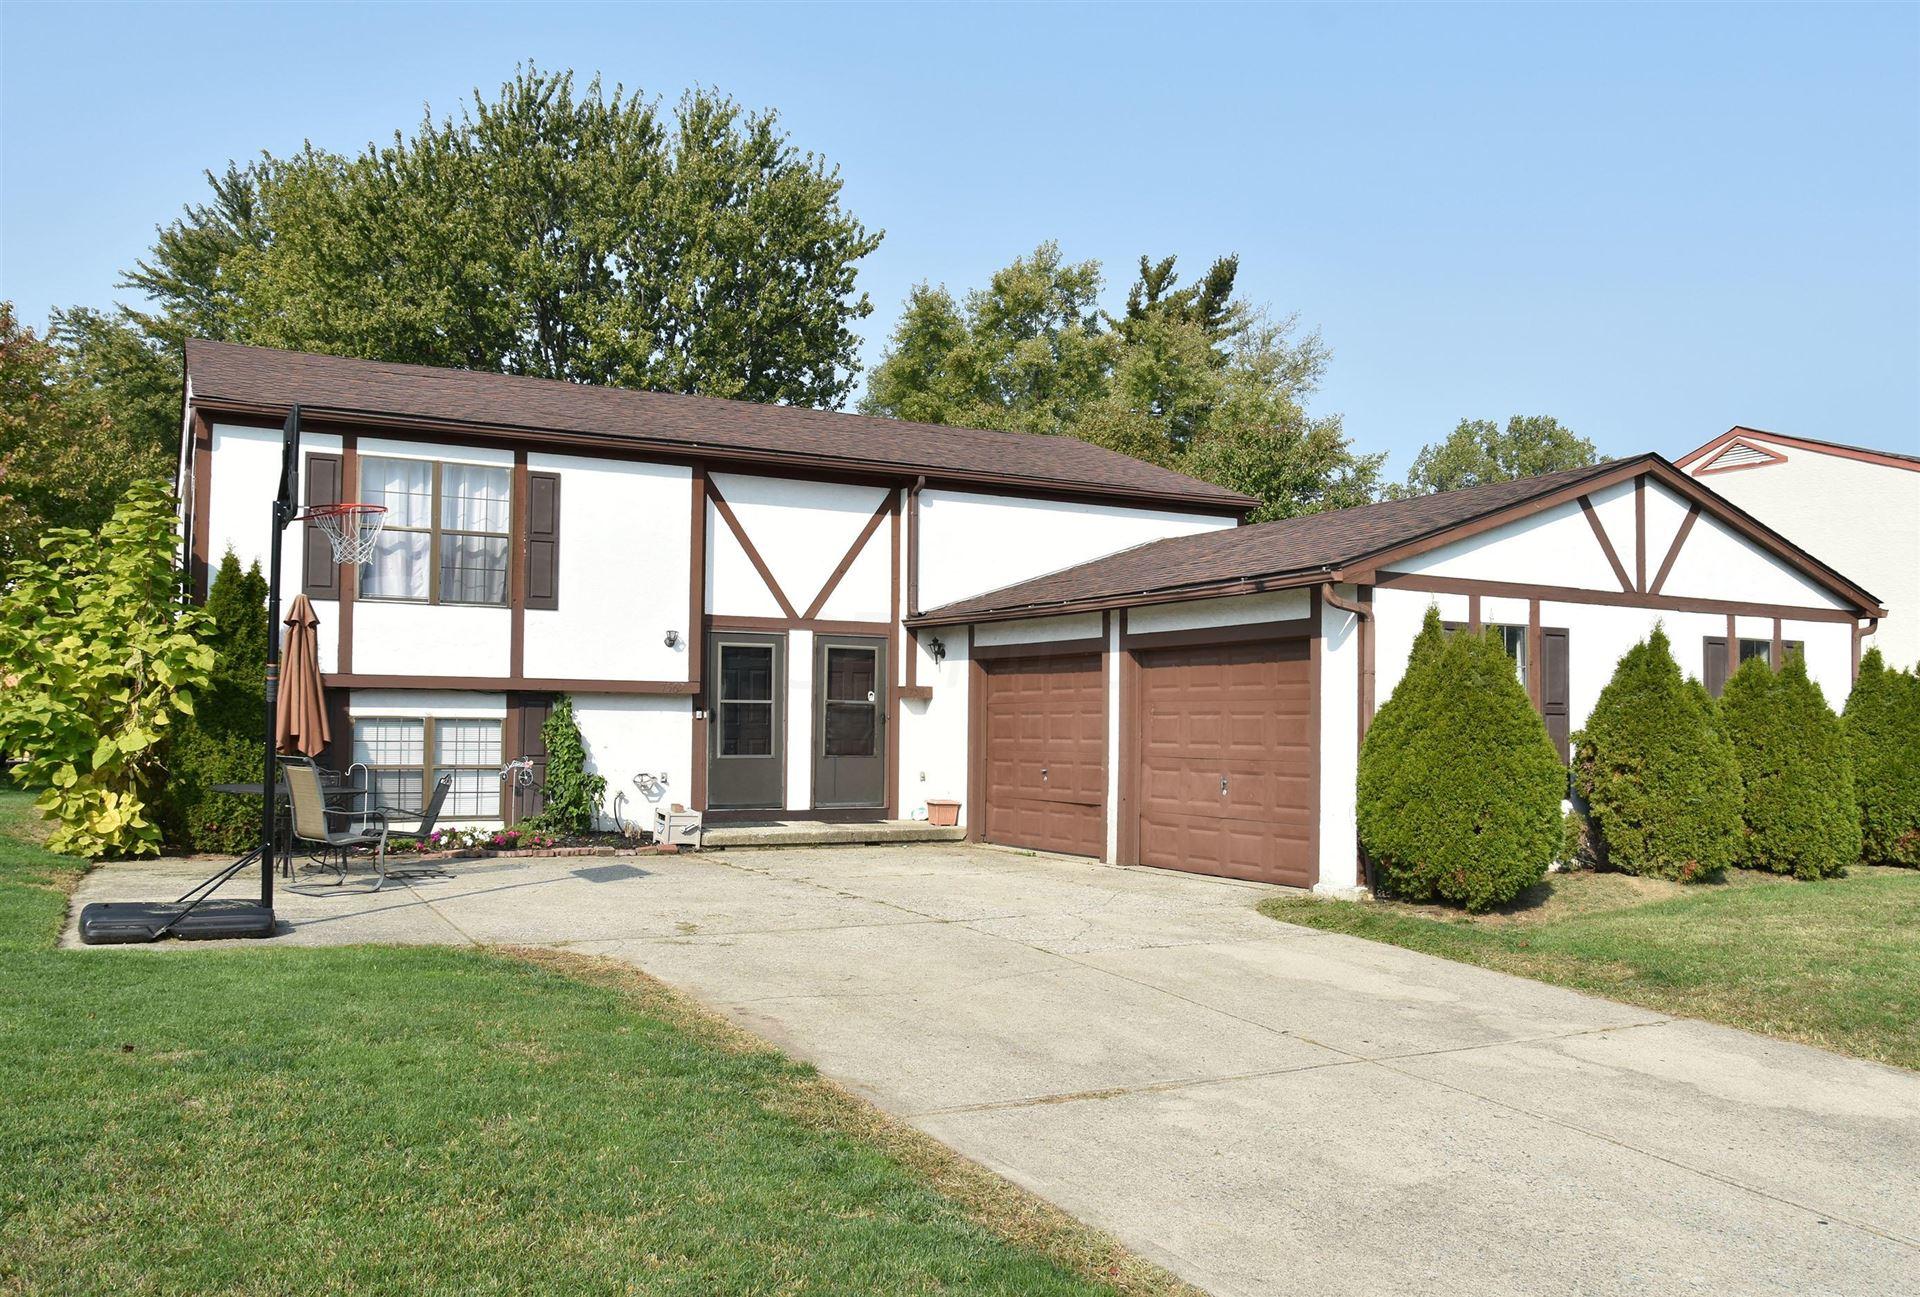 Photo of 7565 Bella Drive, Worthington, OH 43085 (MLS # 220033896)